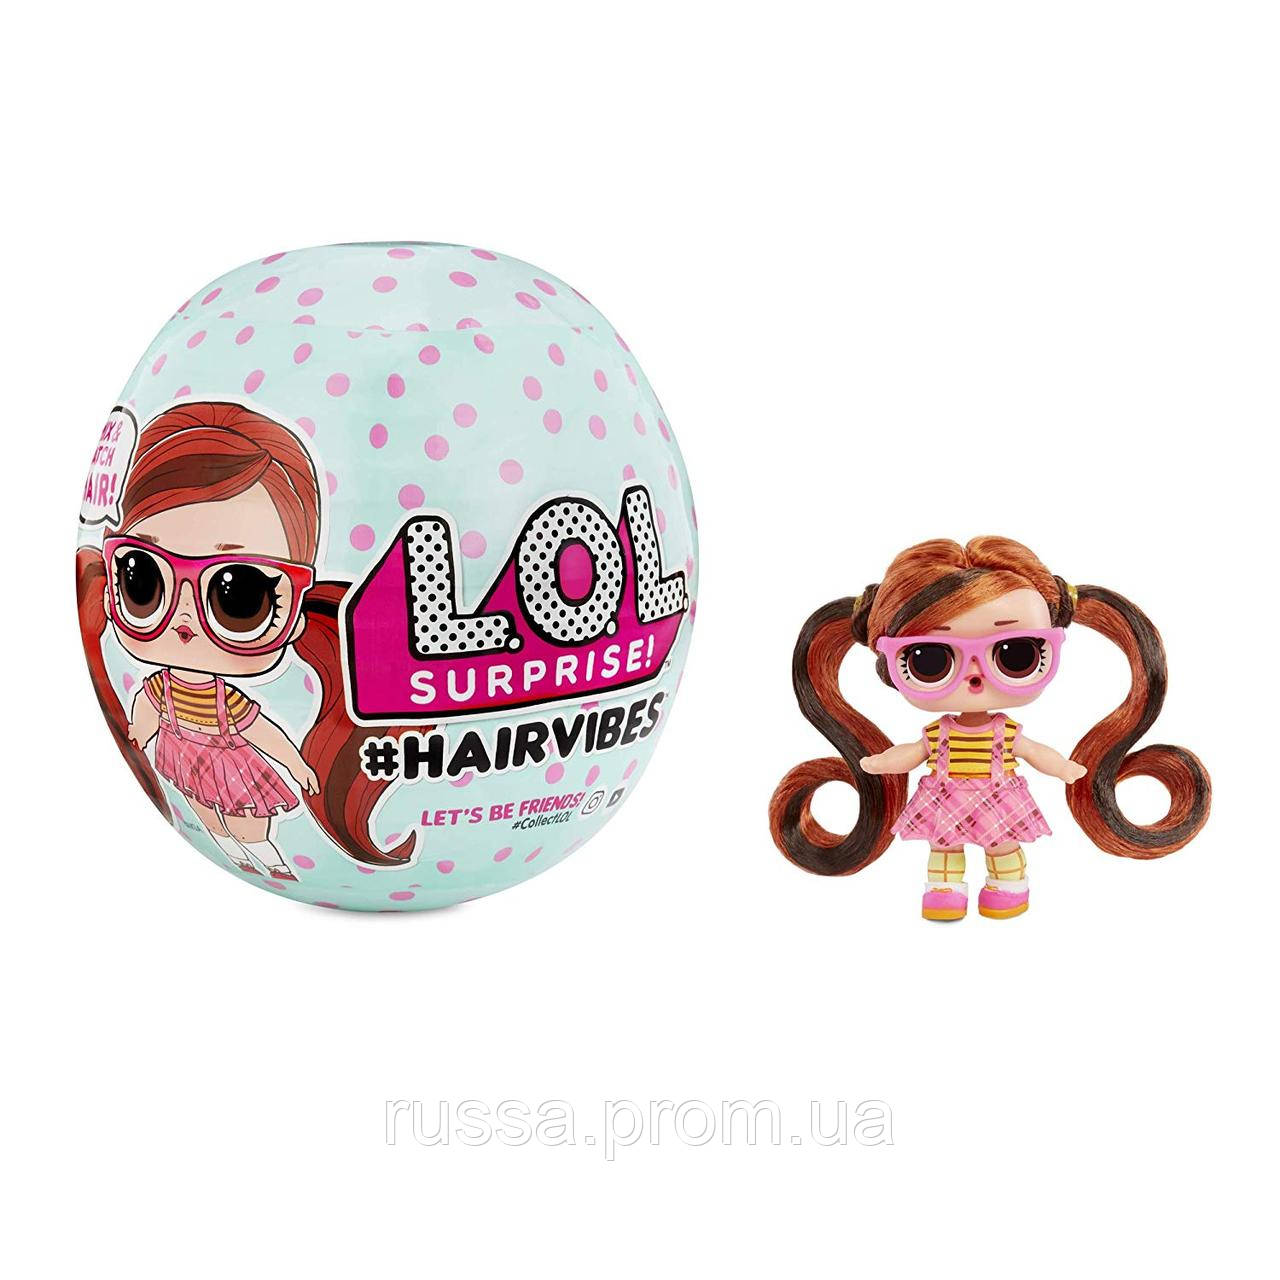 Кукла ЛОЛ в шаре с париками LOL Surprise Hairvibes ЛОЛ Хейервайбс